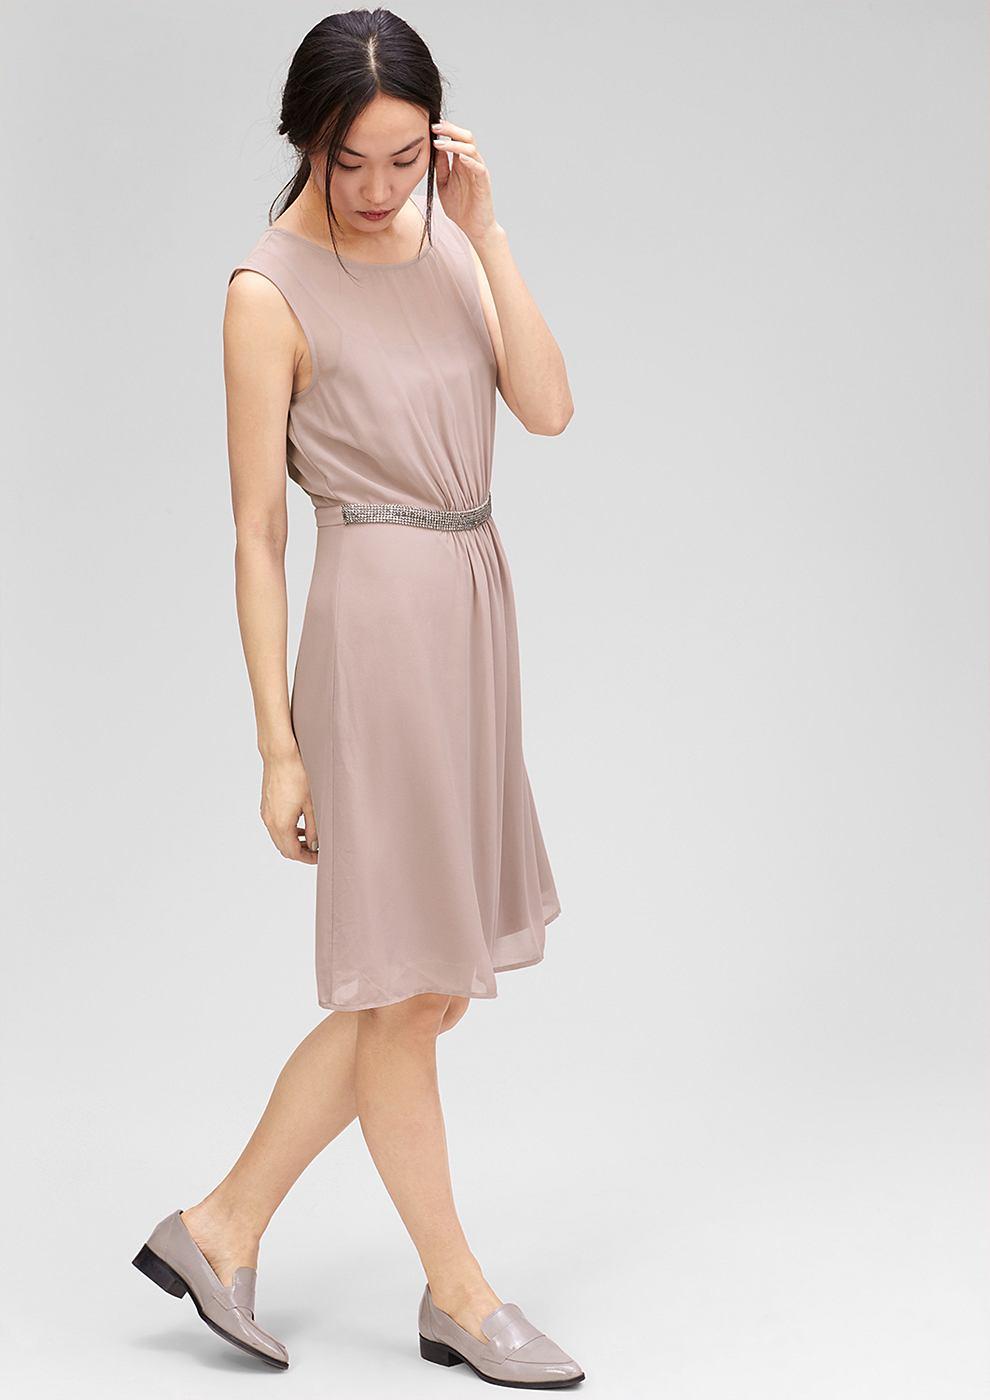 s.Oliver Premium chiffon jurk met glittersteentjes bruin